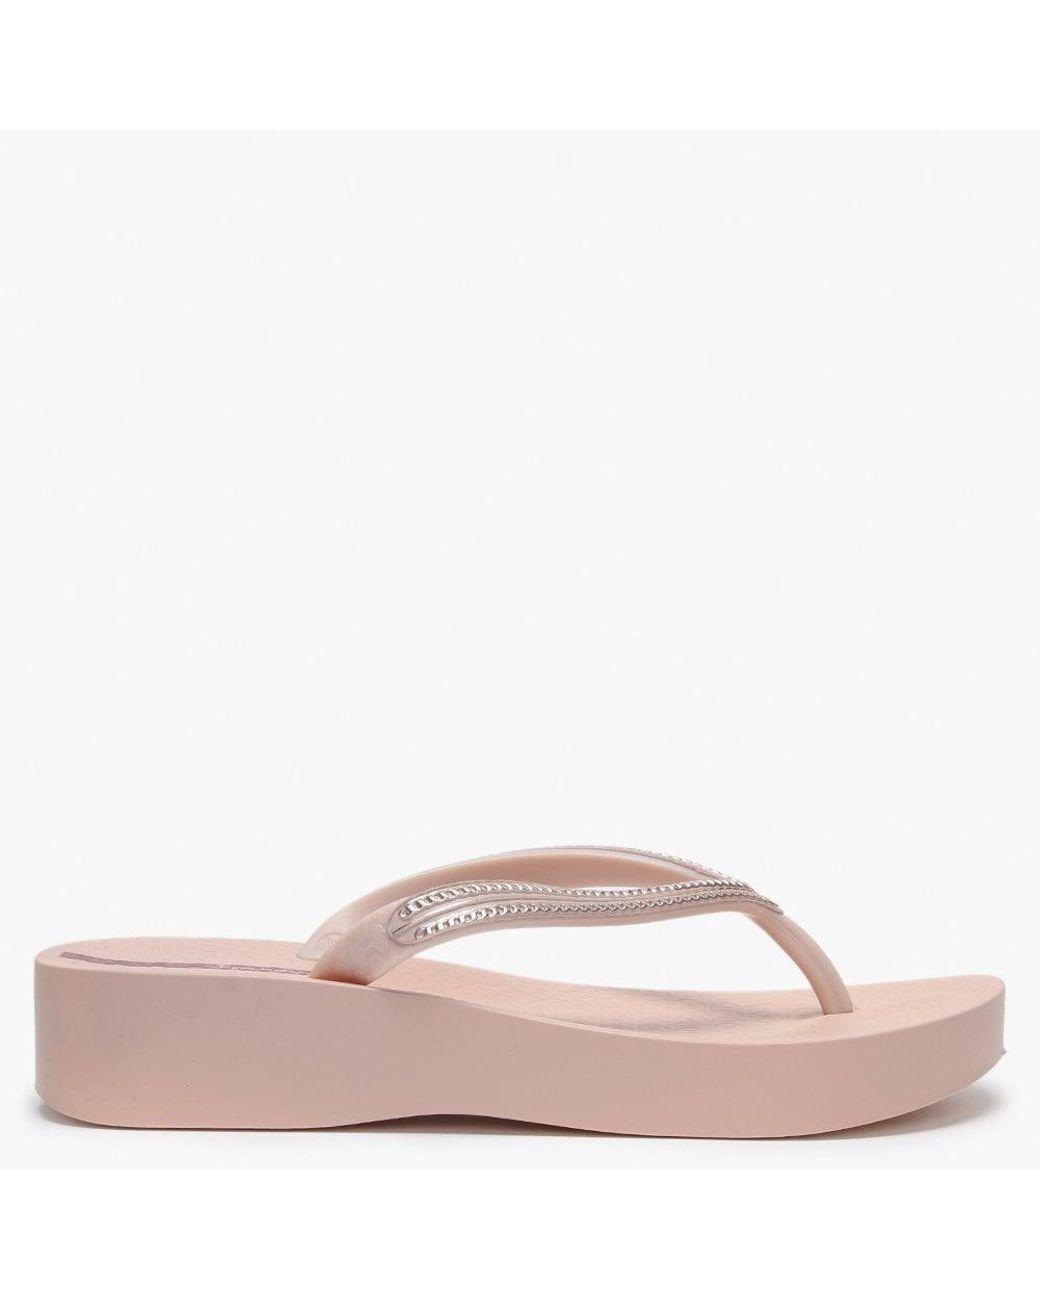 Ipanema MESH WEDGE Womens Ladies Summer Beach Toe Post Sandals Flip Flops Black